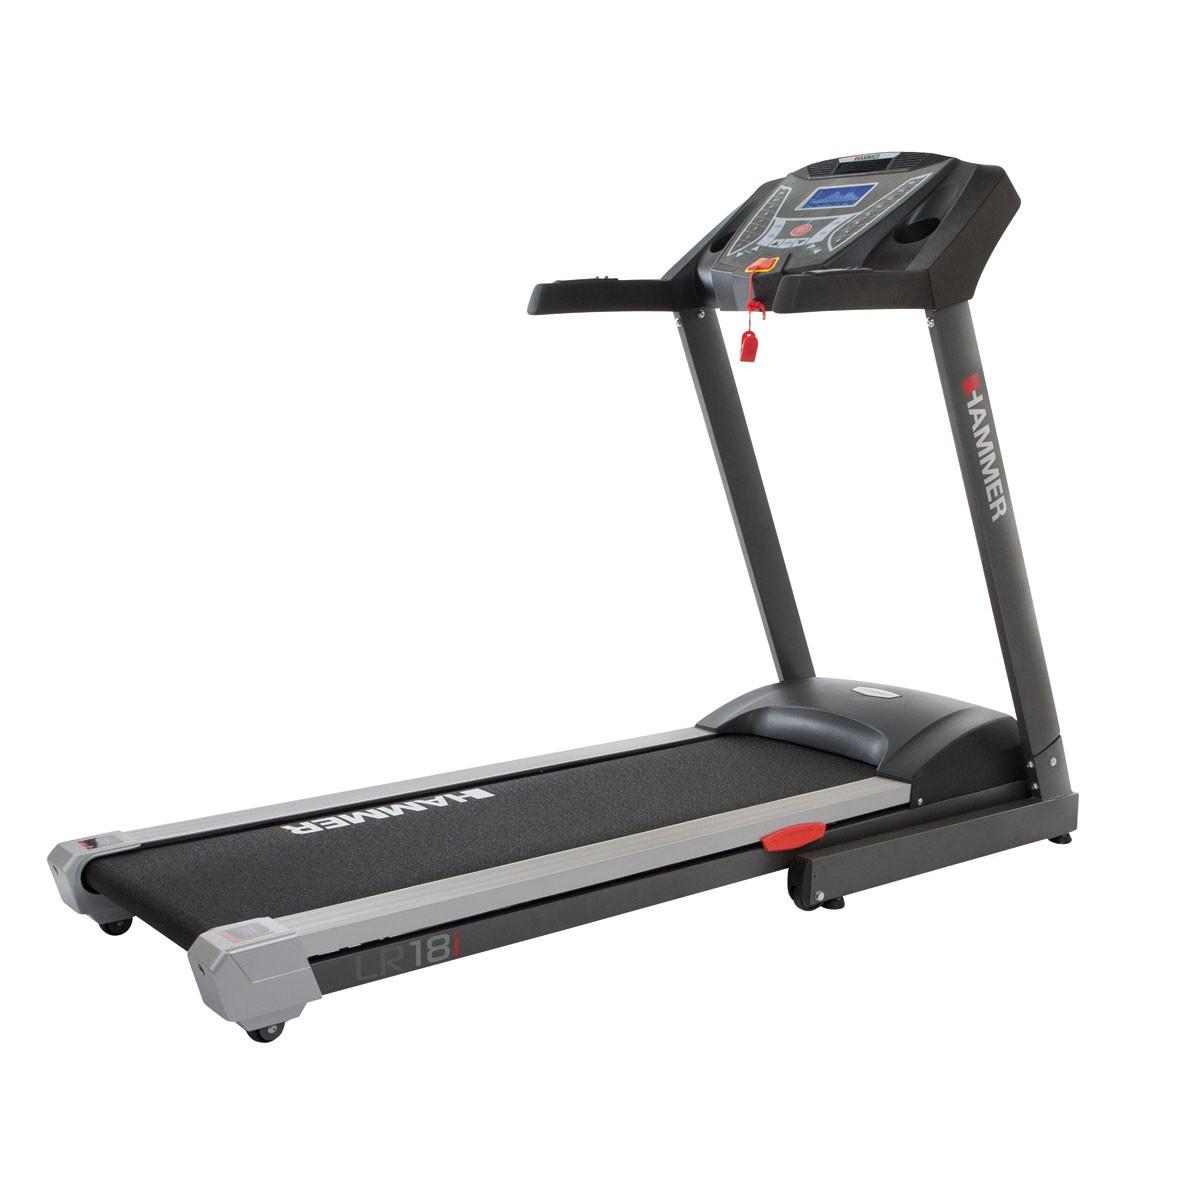 afg sport 2.5 treadmill manual